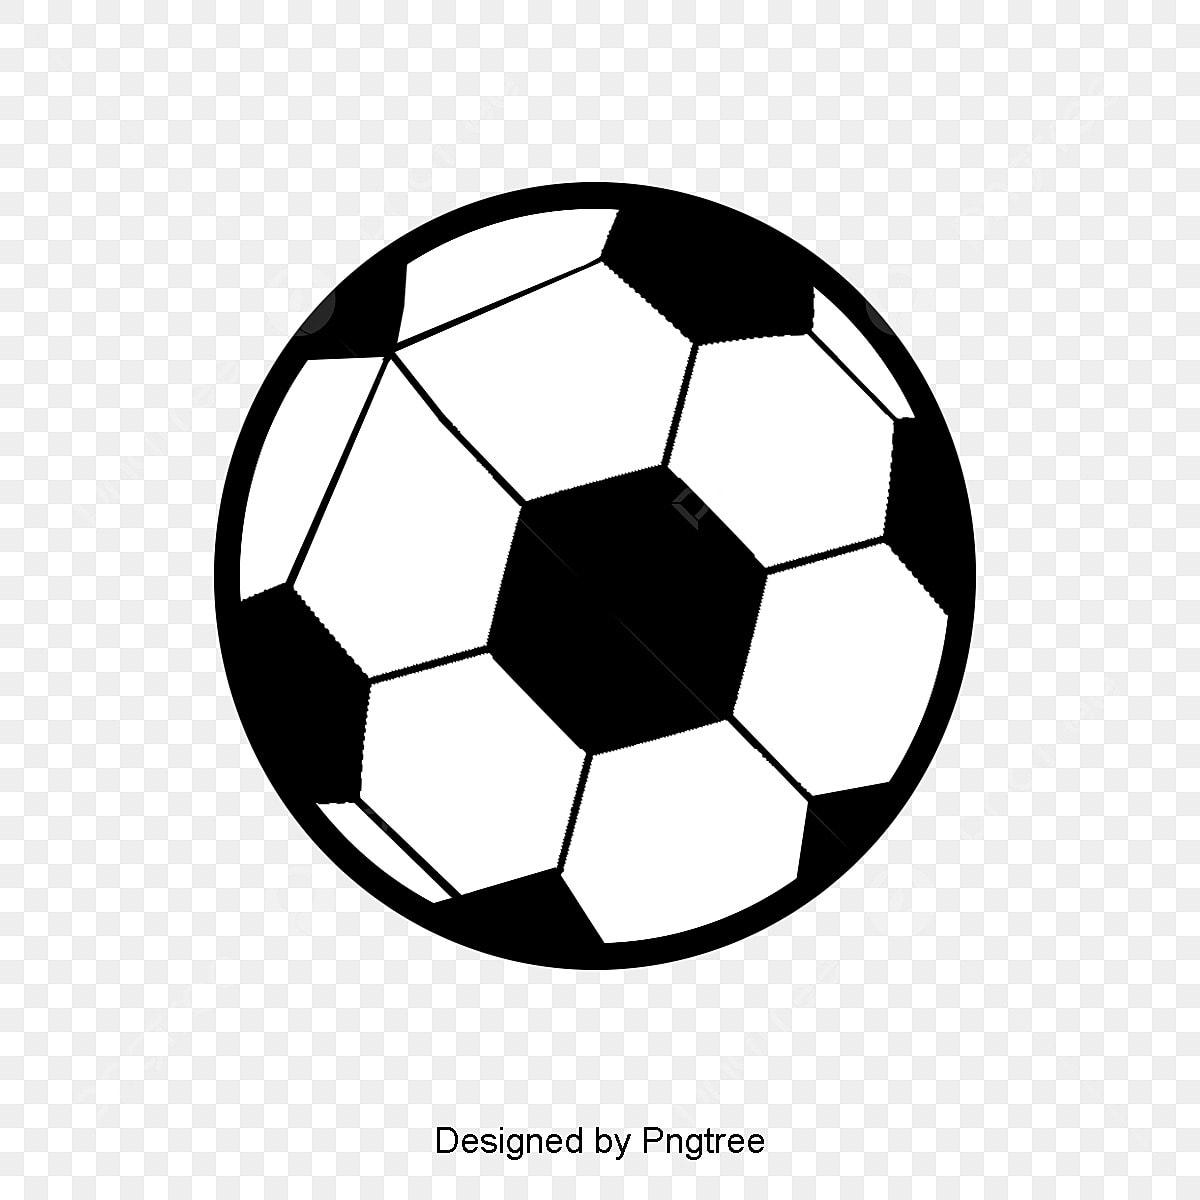 cartoon black and white football logo  football clipart  logo clipart  cartoon png transparent